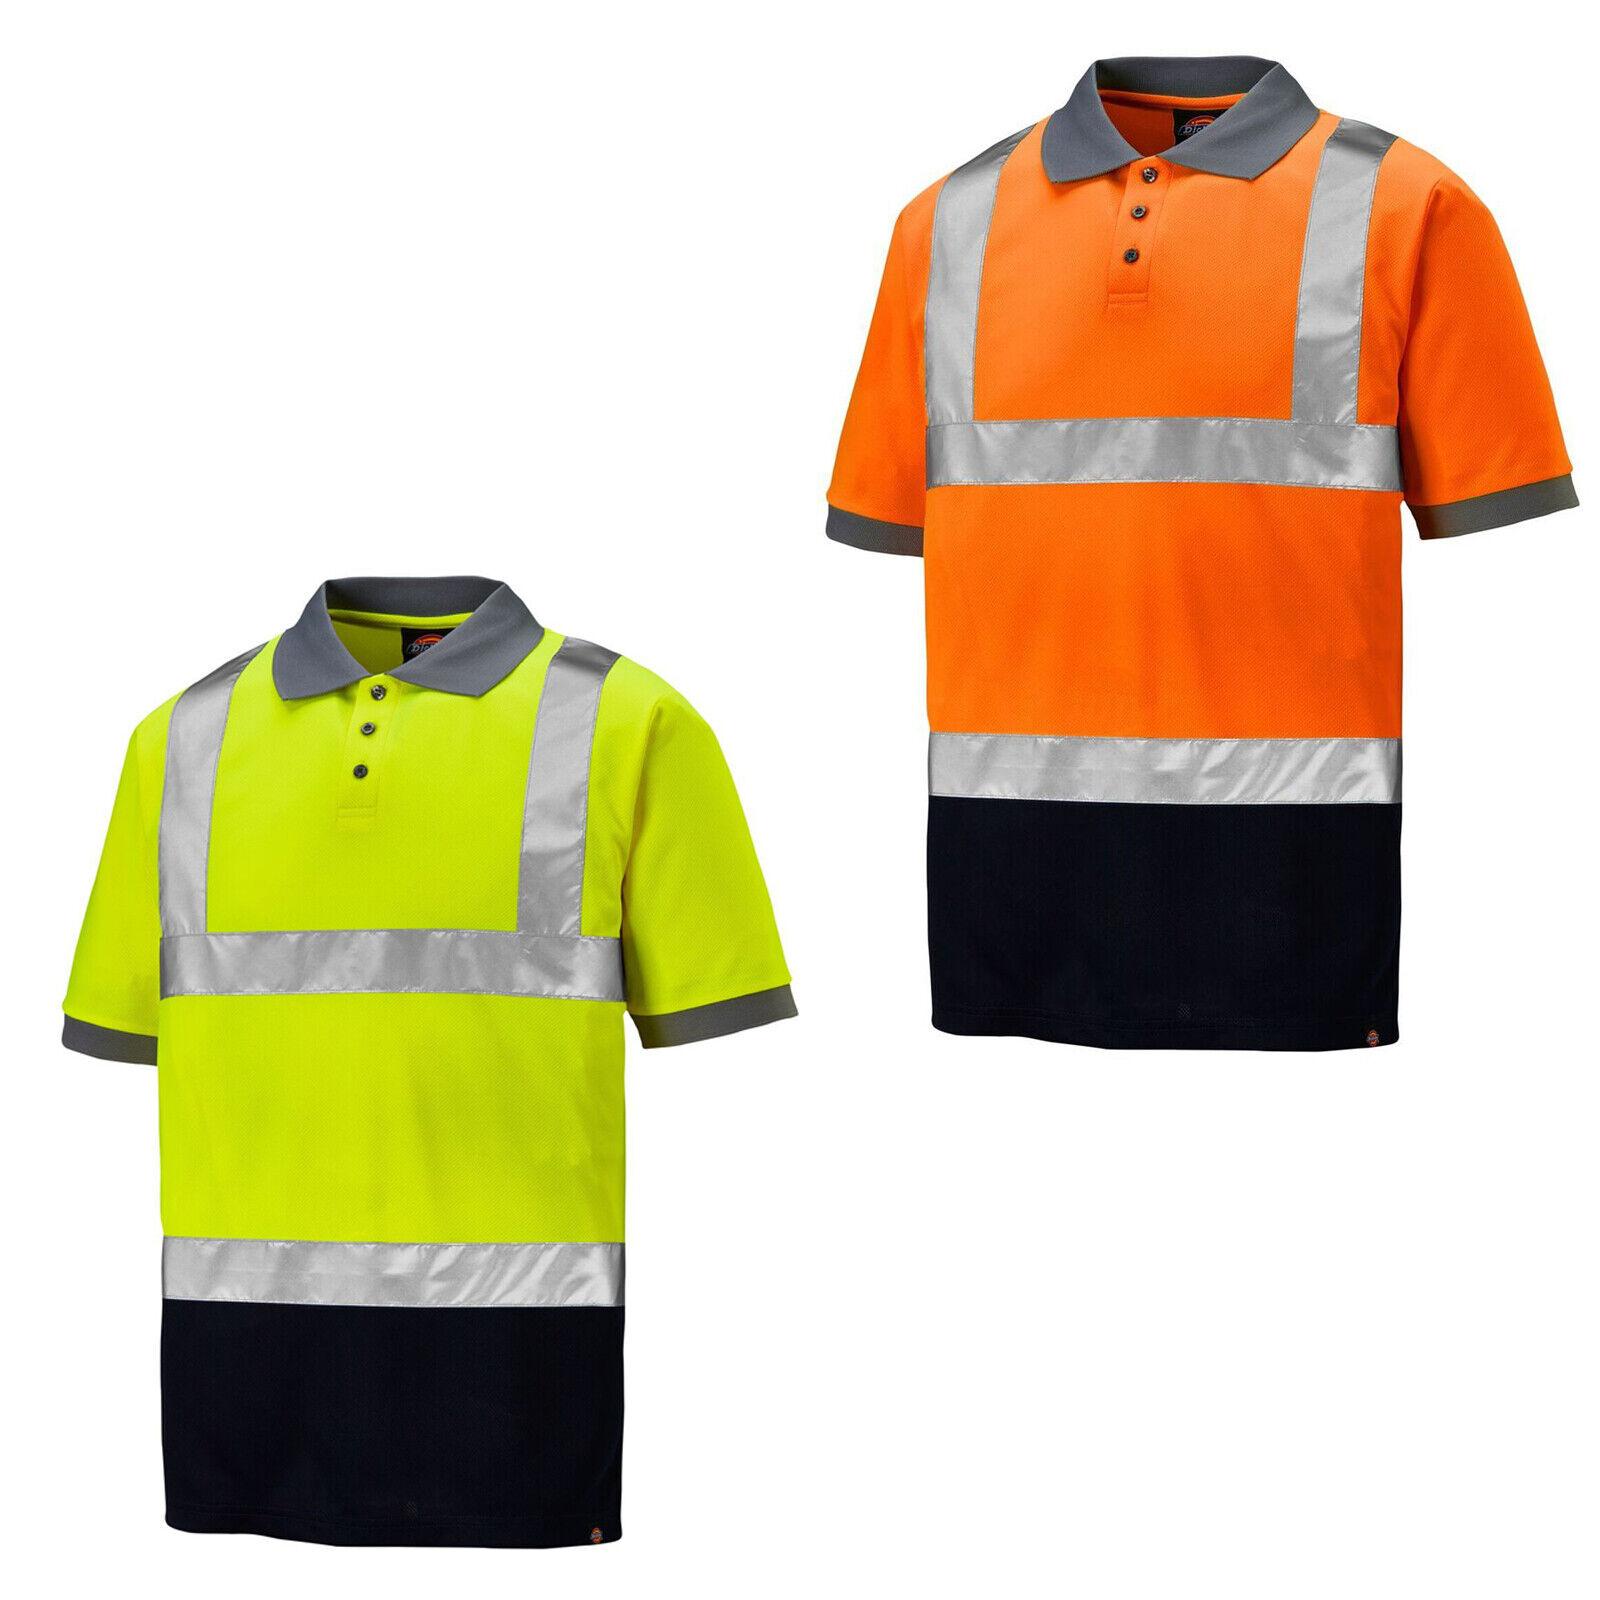 09f18cac1 Dickies Two Tone Hi Vis Polo Hombre manga corta trabajo PPE Tee SA22076